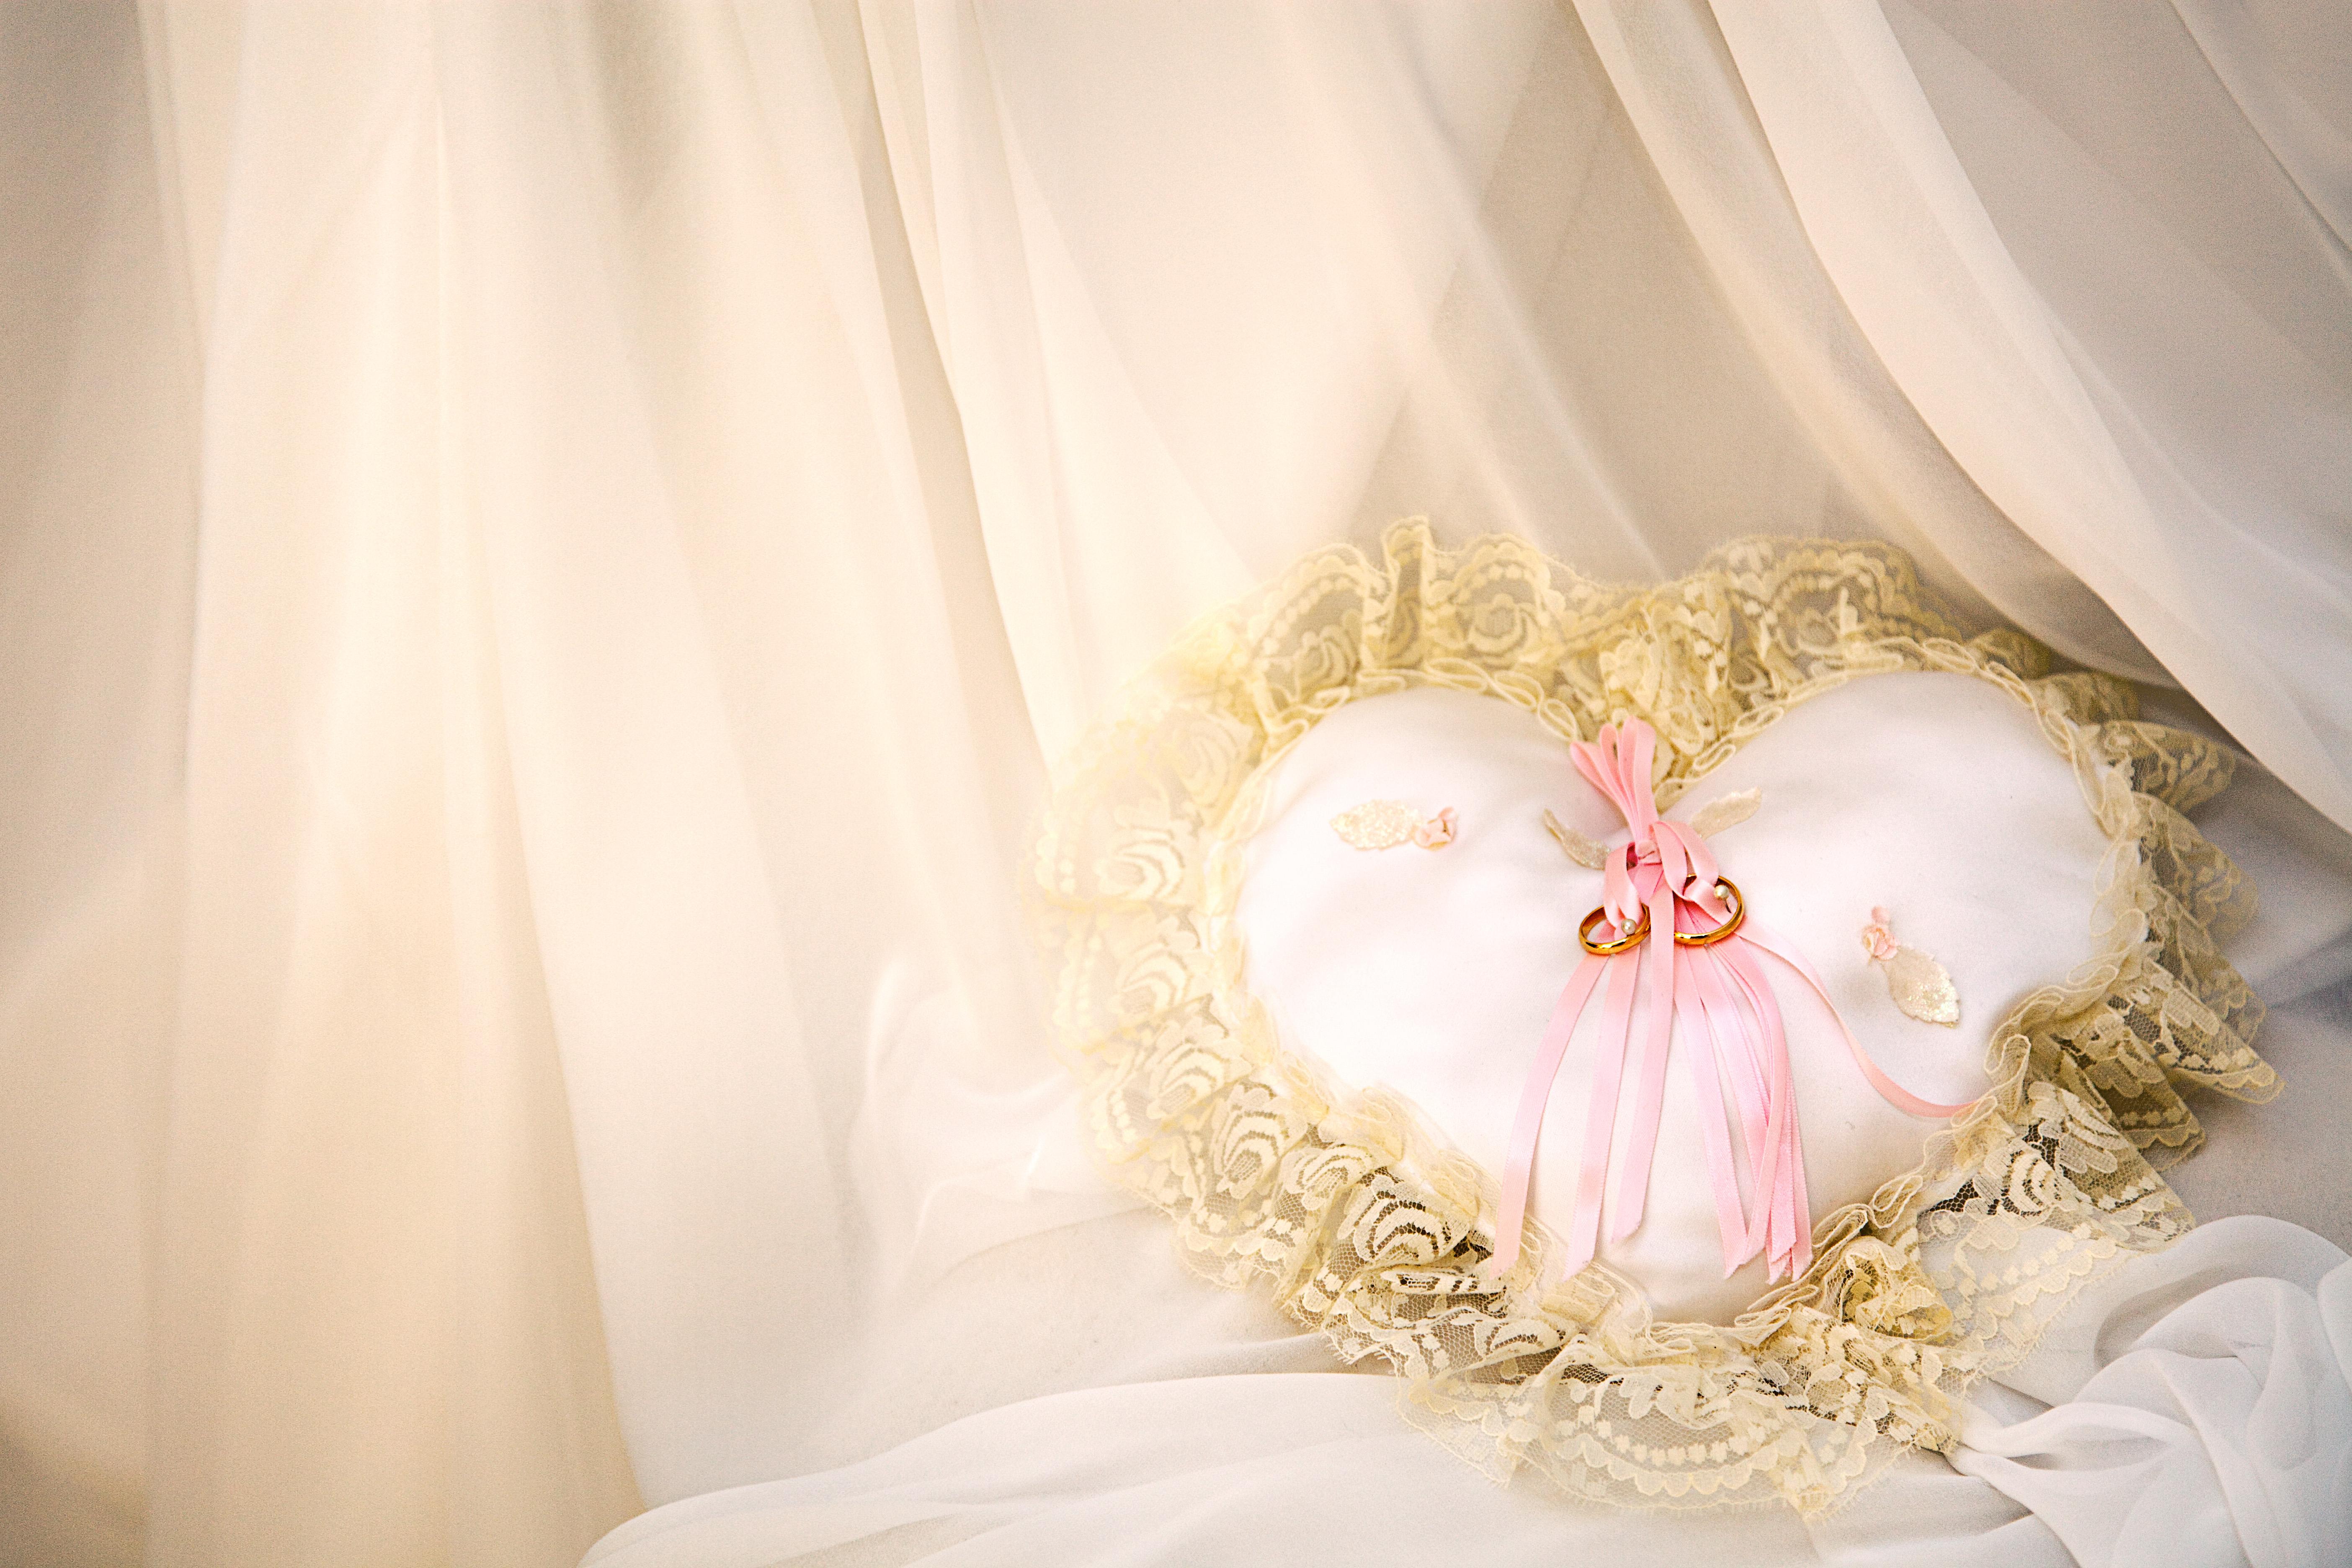 Wedding Wallpaper Images - WallpaperSafari